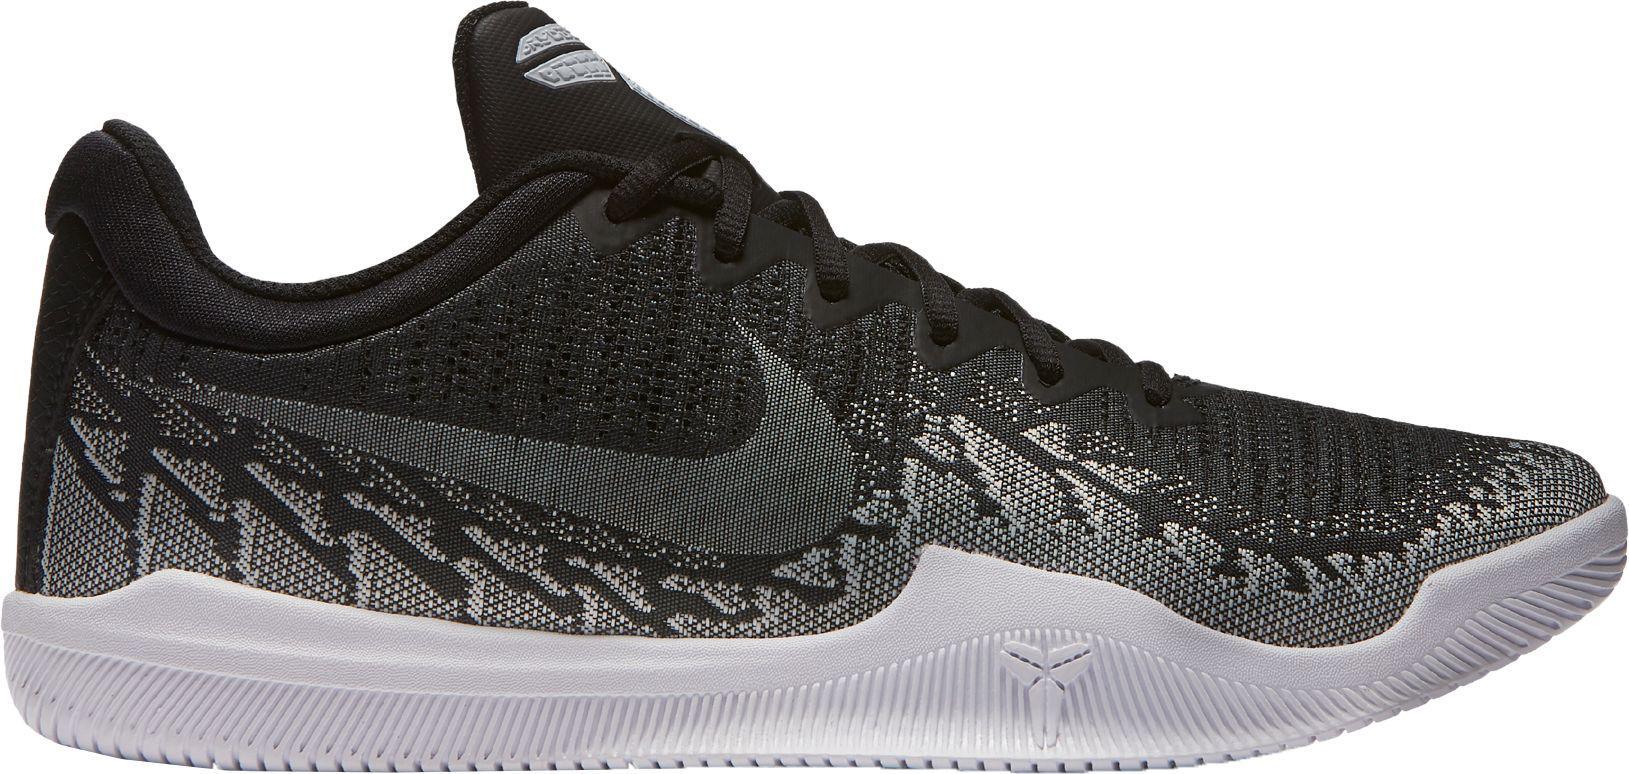 6788ca111f7 Nike Kobe Mamba Rage Basketball Shoes in Black for Men - Lyst